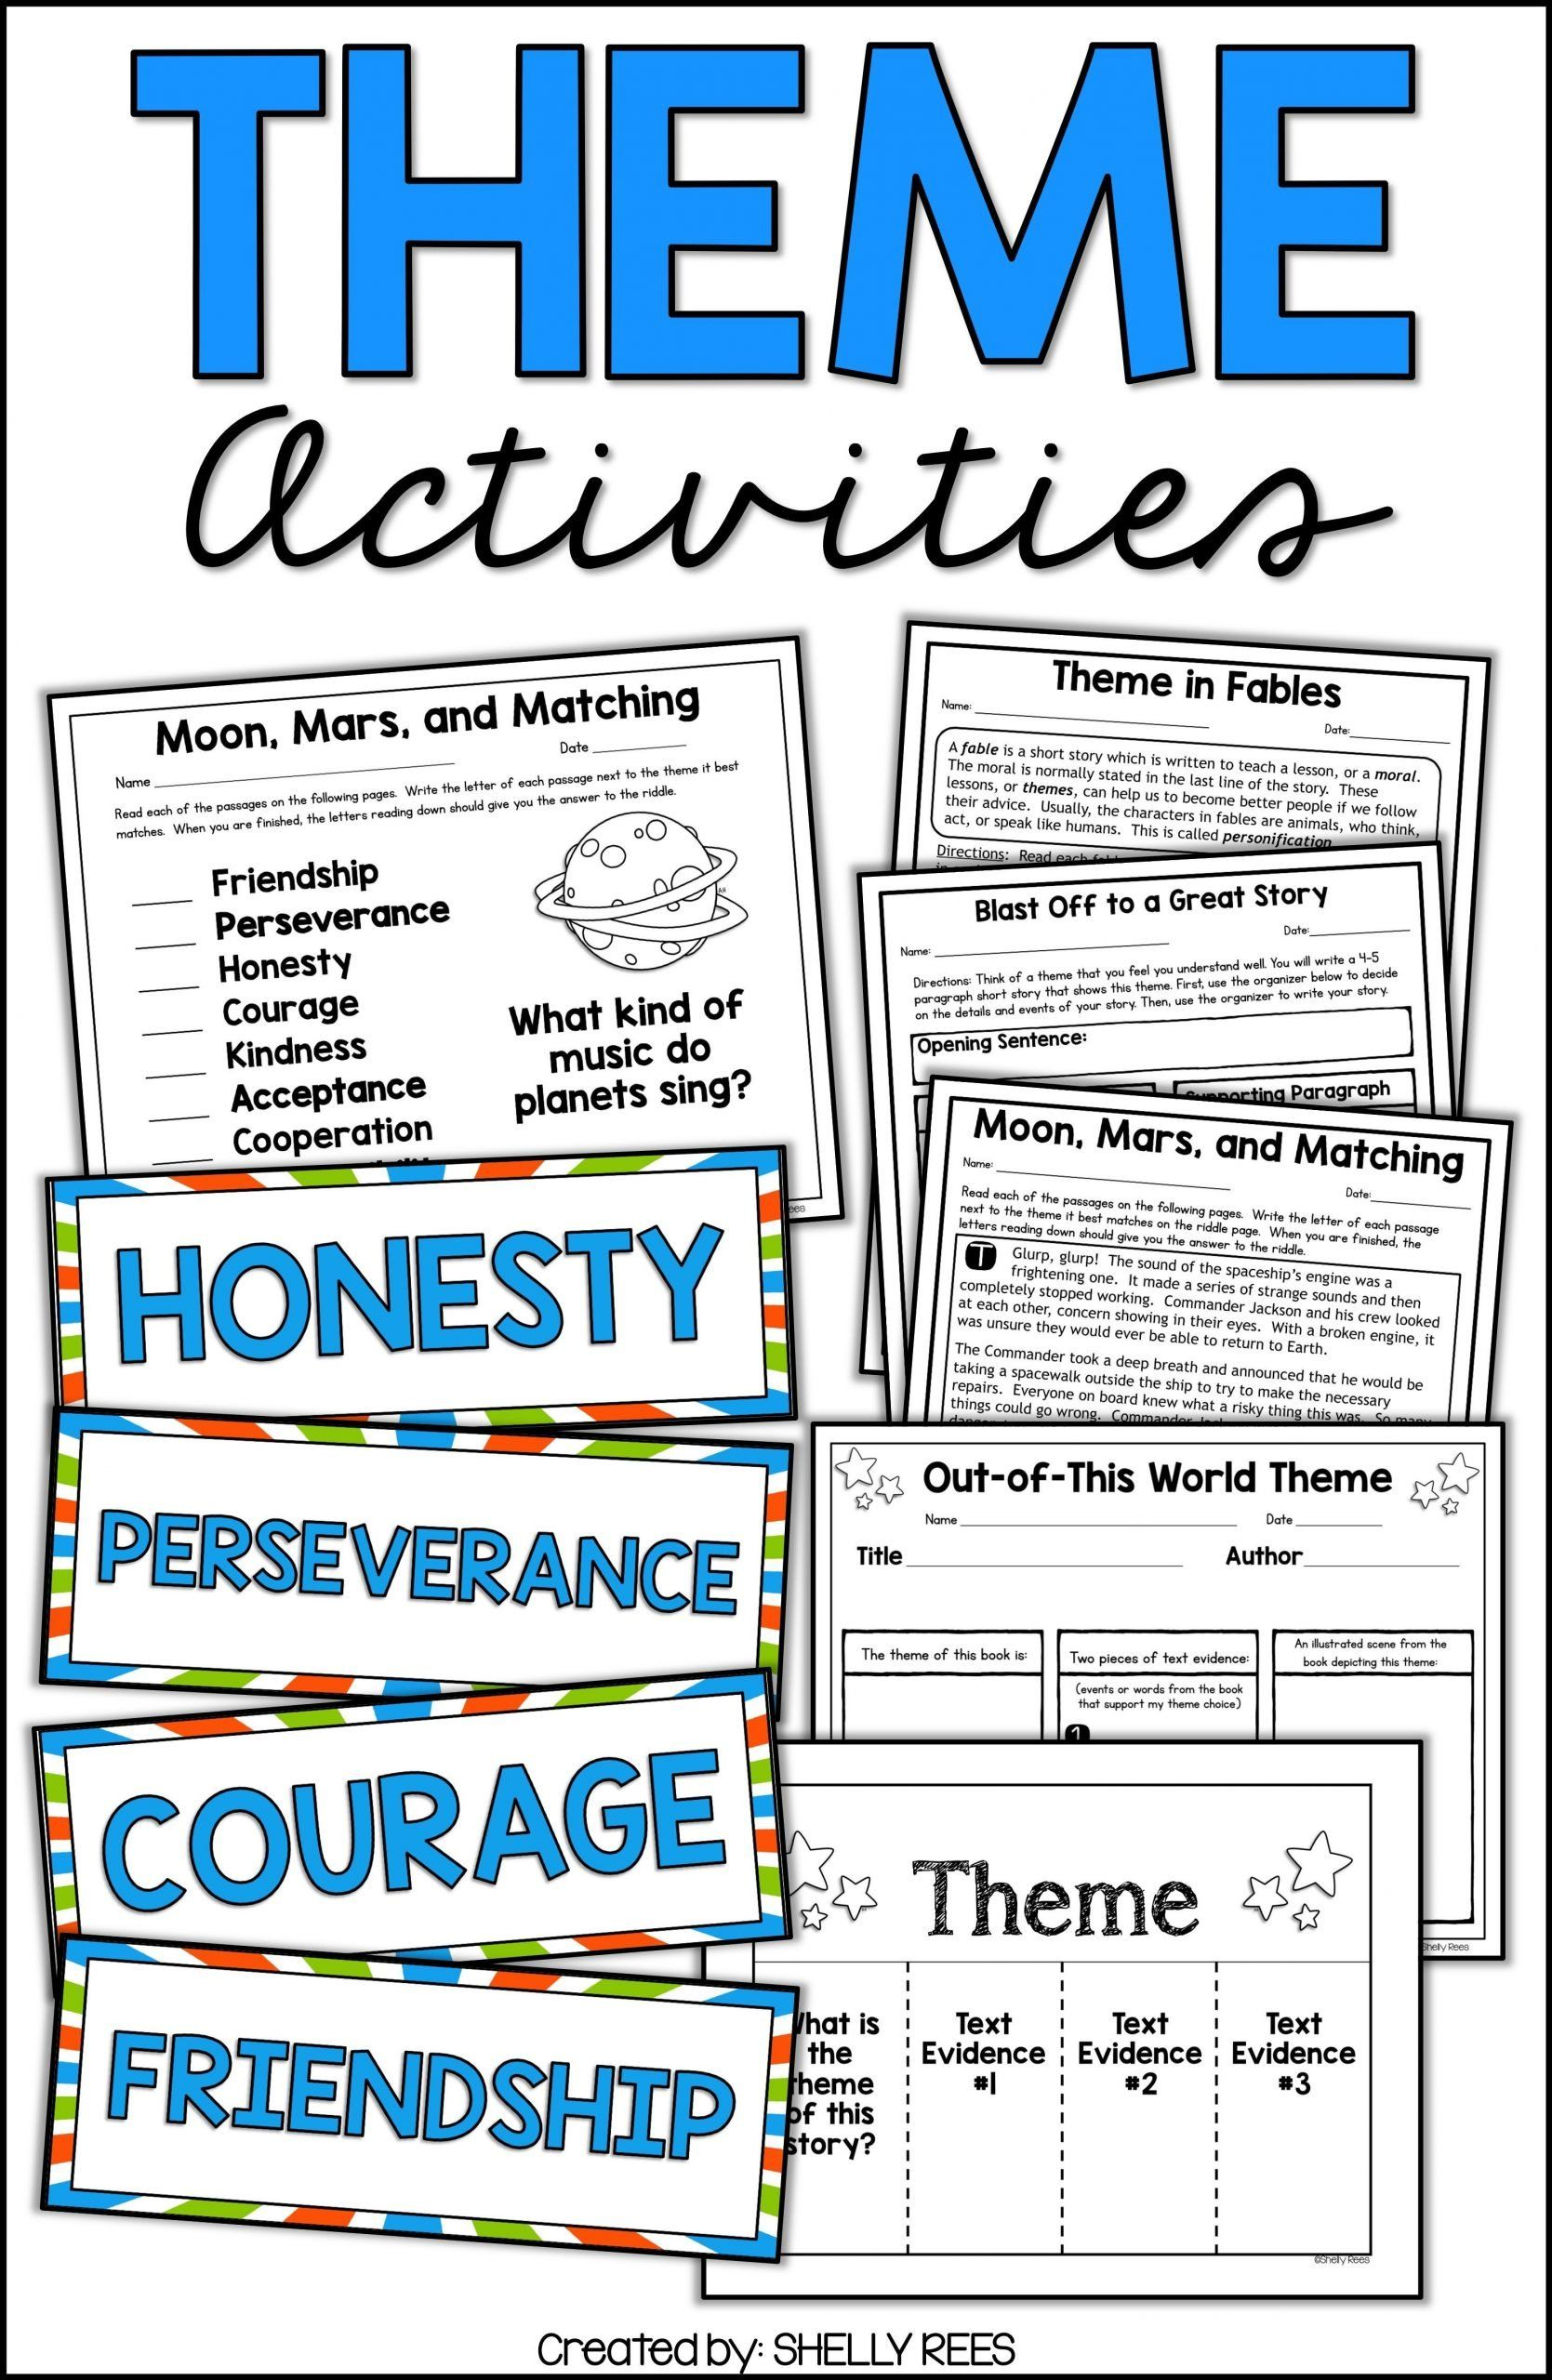 Theme Worksheet 4th Grade Theme And Teaching Theme 2020